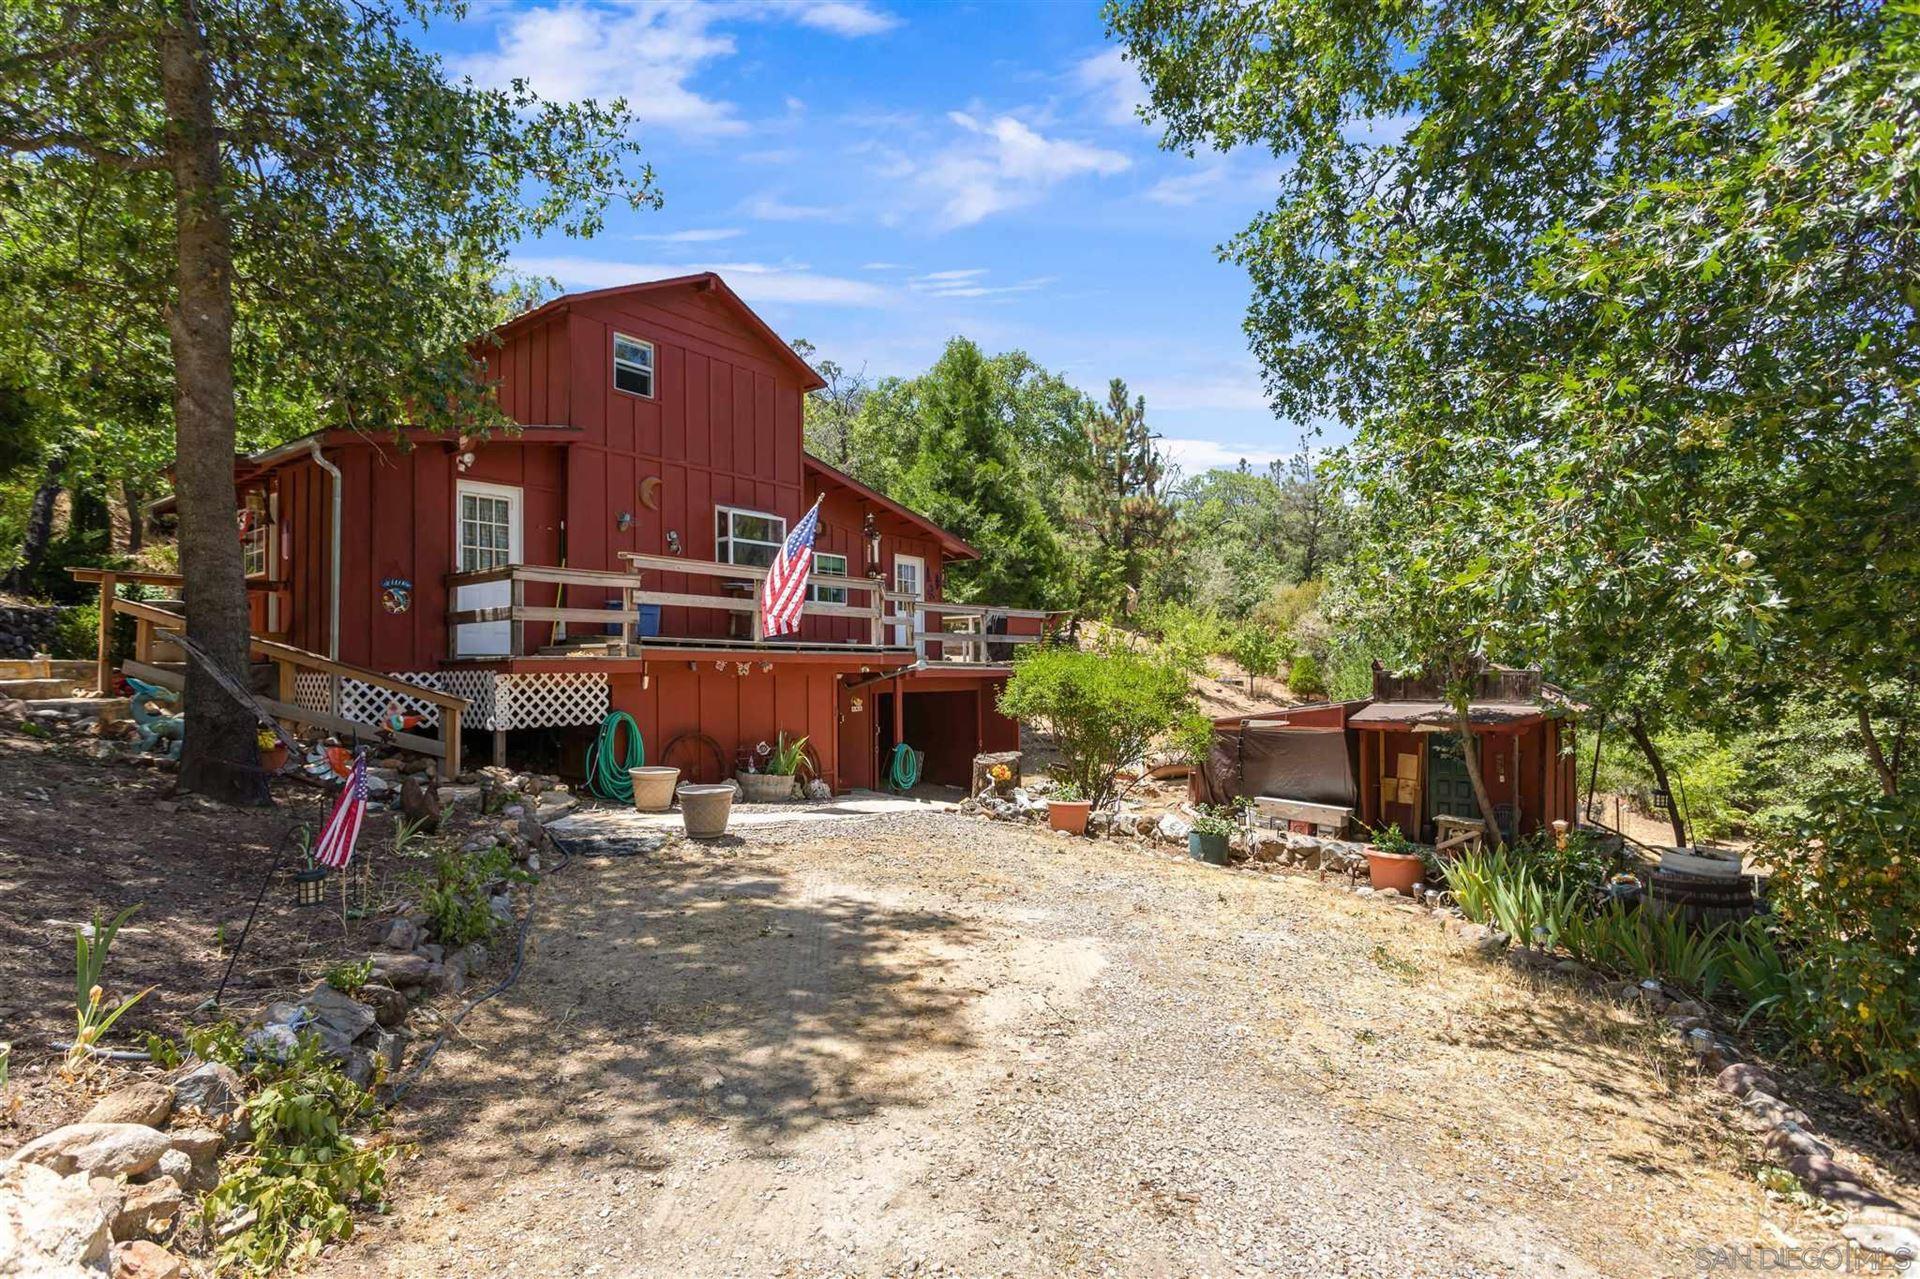 Photo of 1216 Banner View Drive, Julian, CA 92036 (MLS # 210021358)